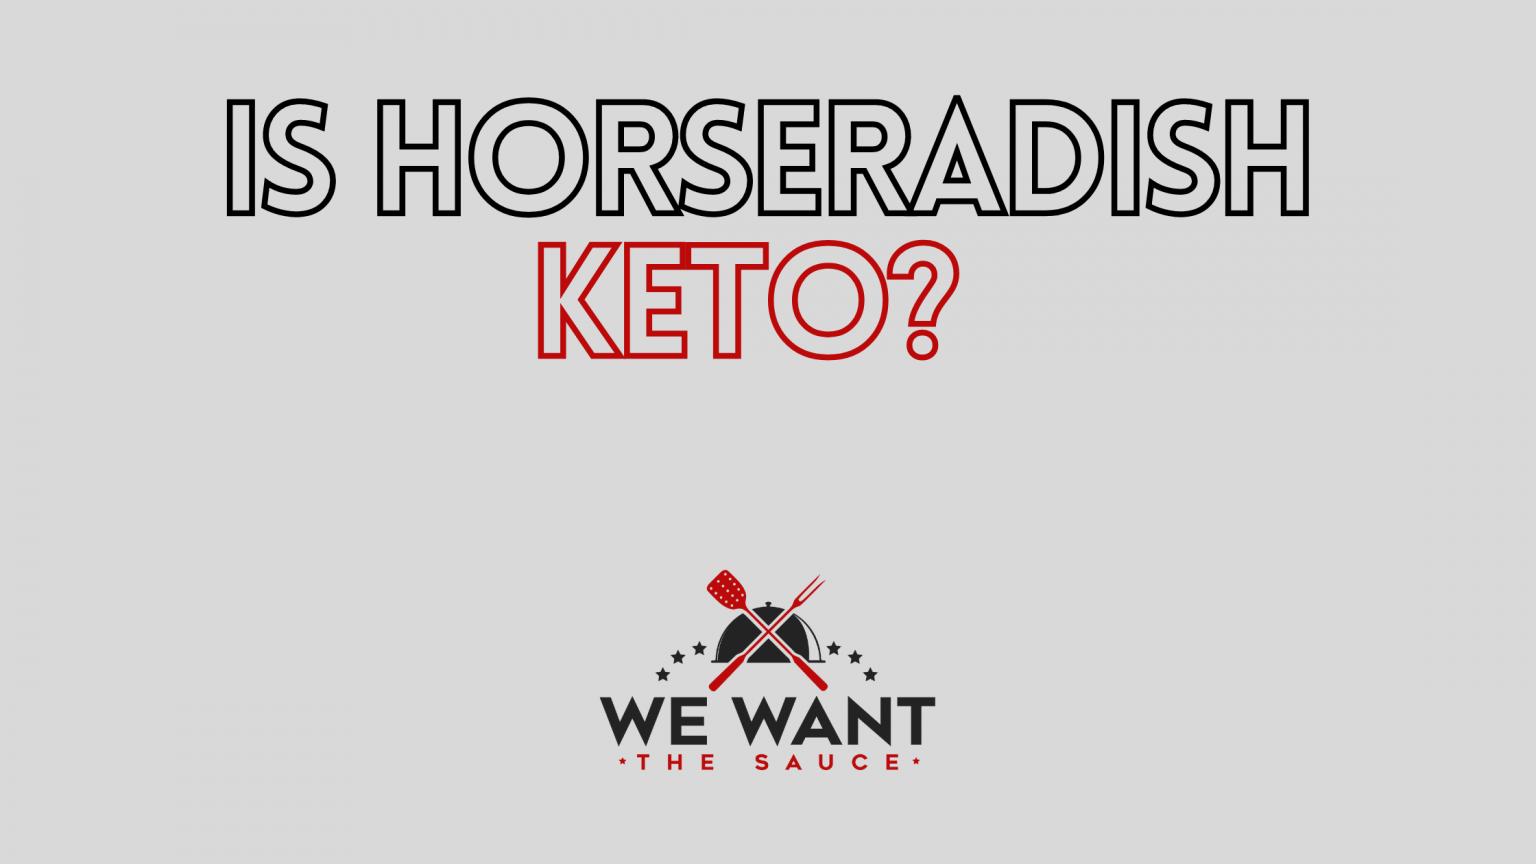 Is Horseradish Keto